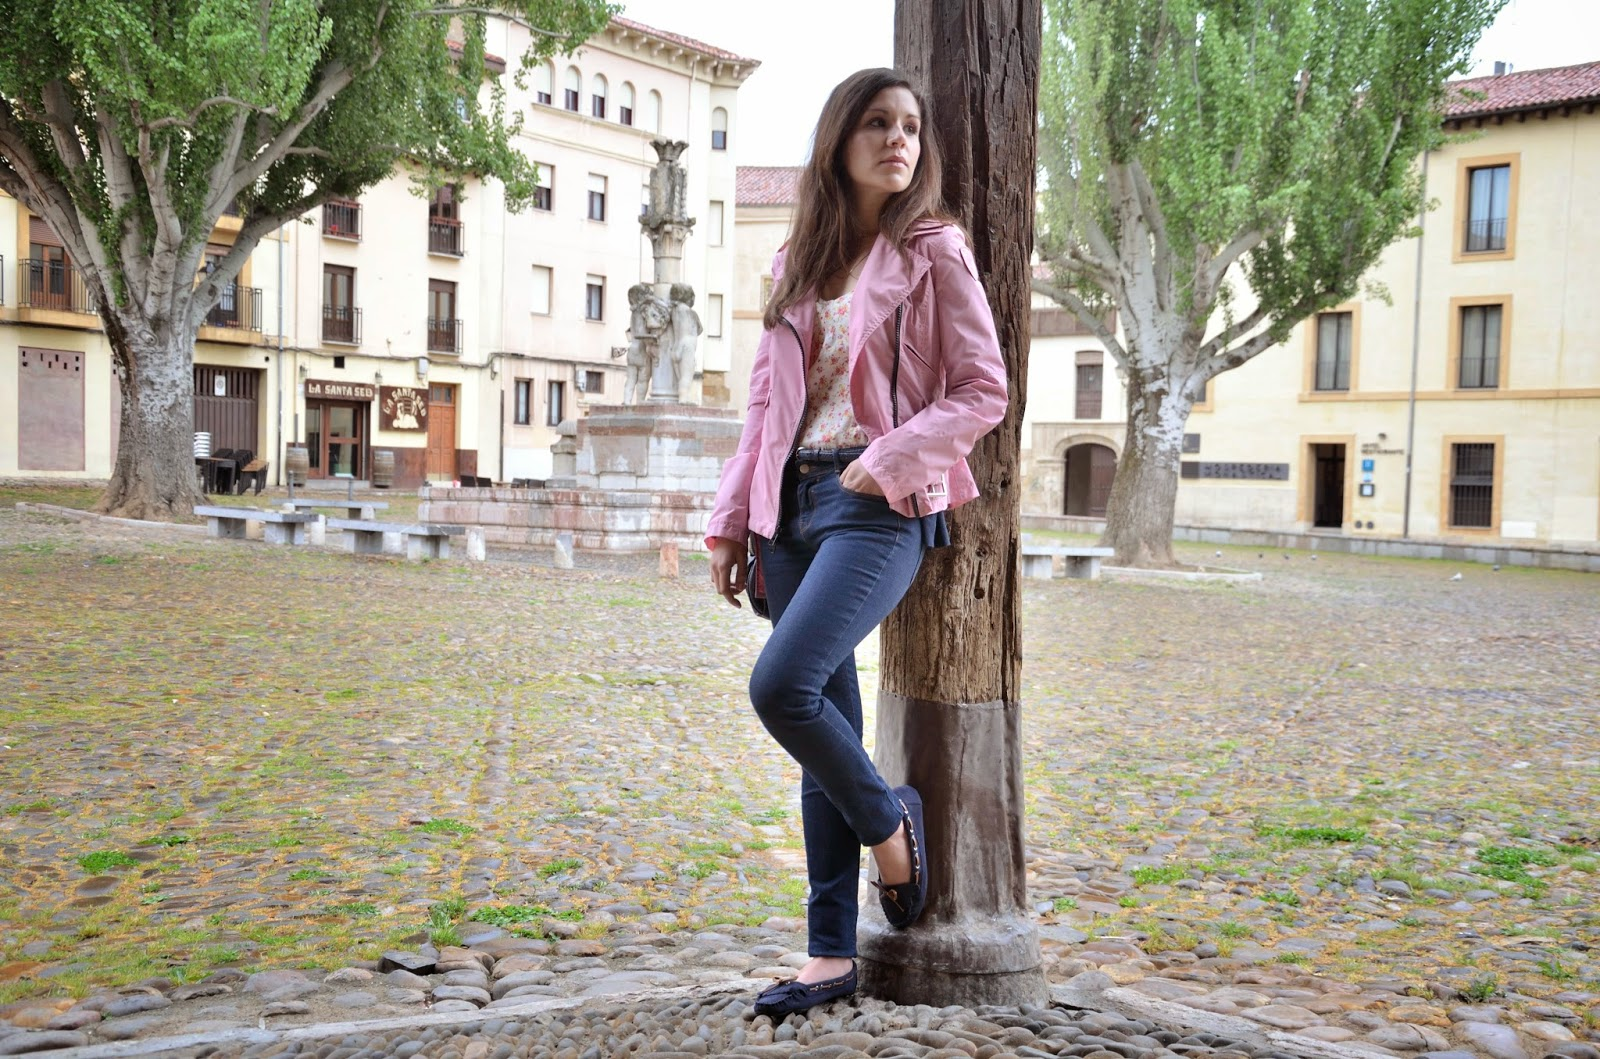 biker-rosa-pink-jeans-flores